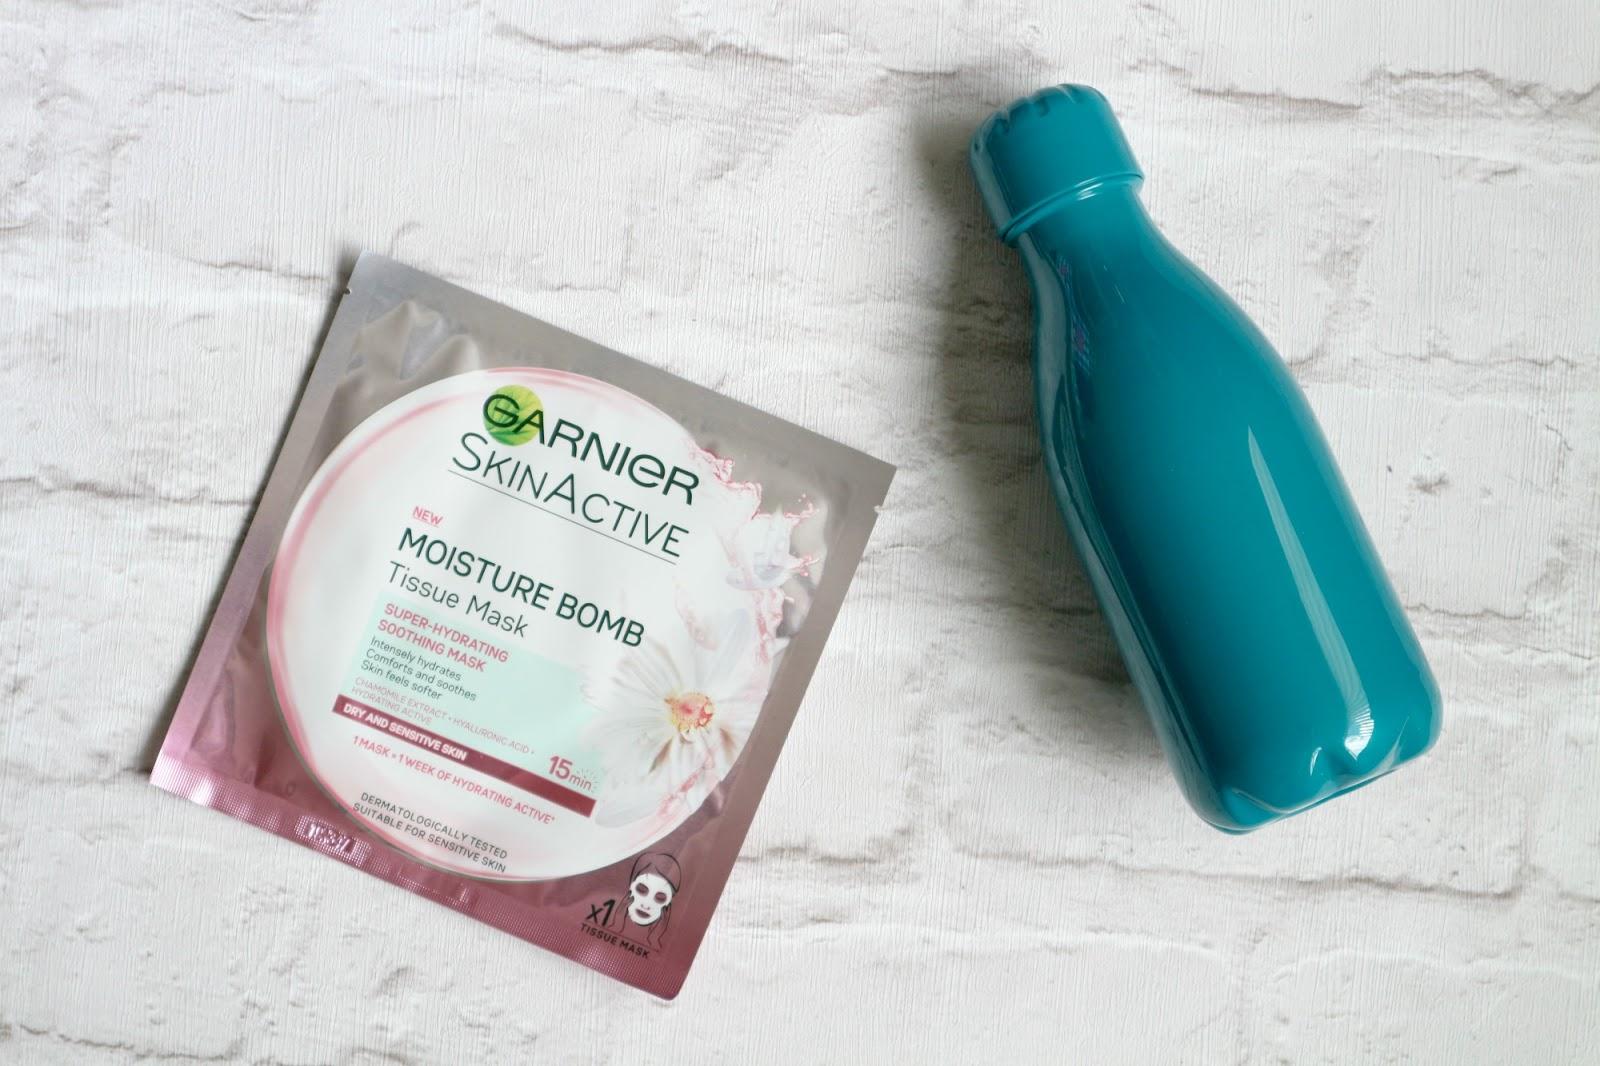 Garnier SkinActive Moisture Bomb Tissue Masks